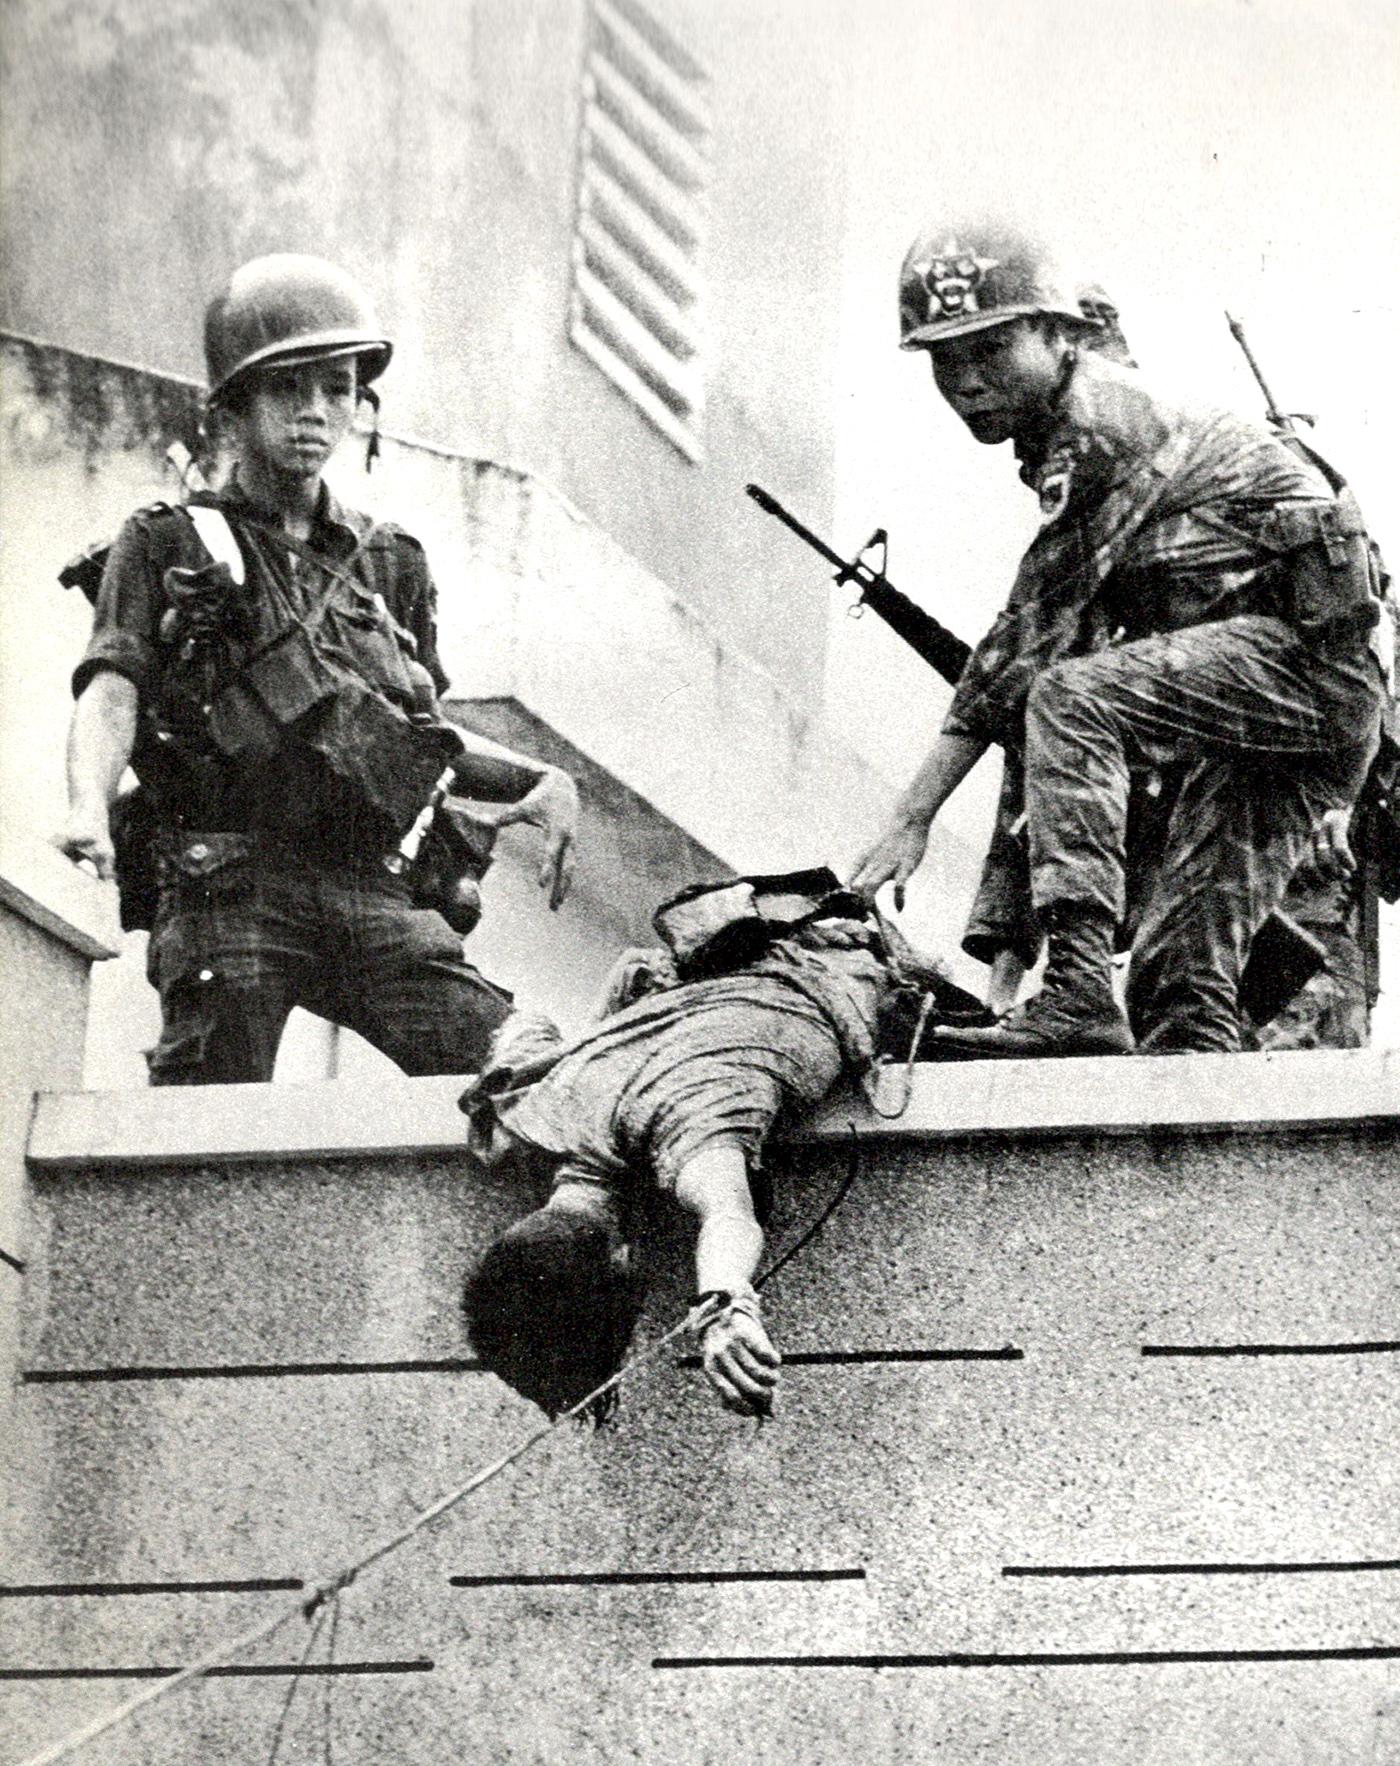 196802_arvn_w_vc_dead_sniper.jpg